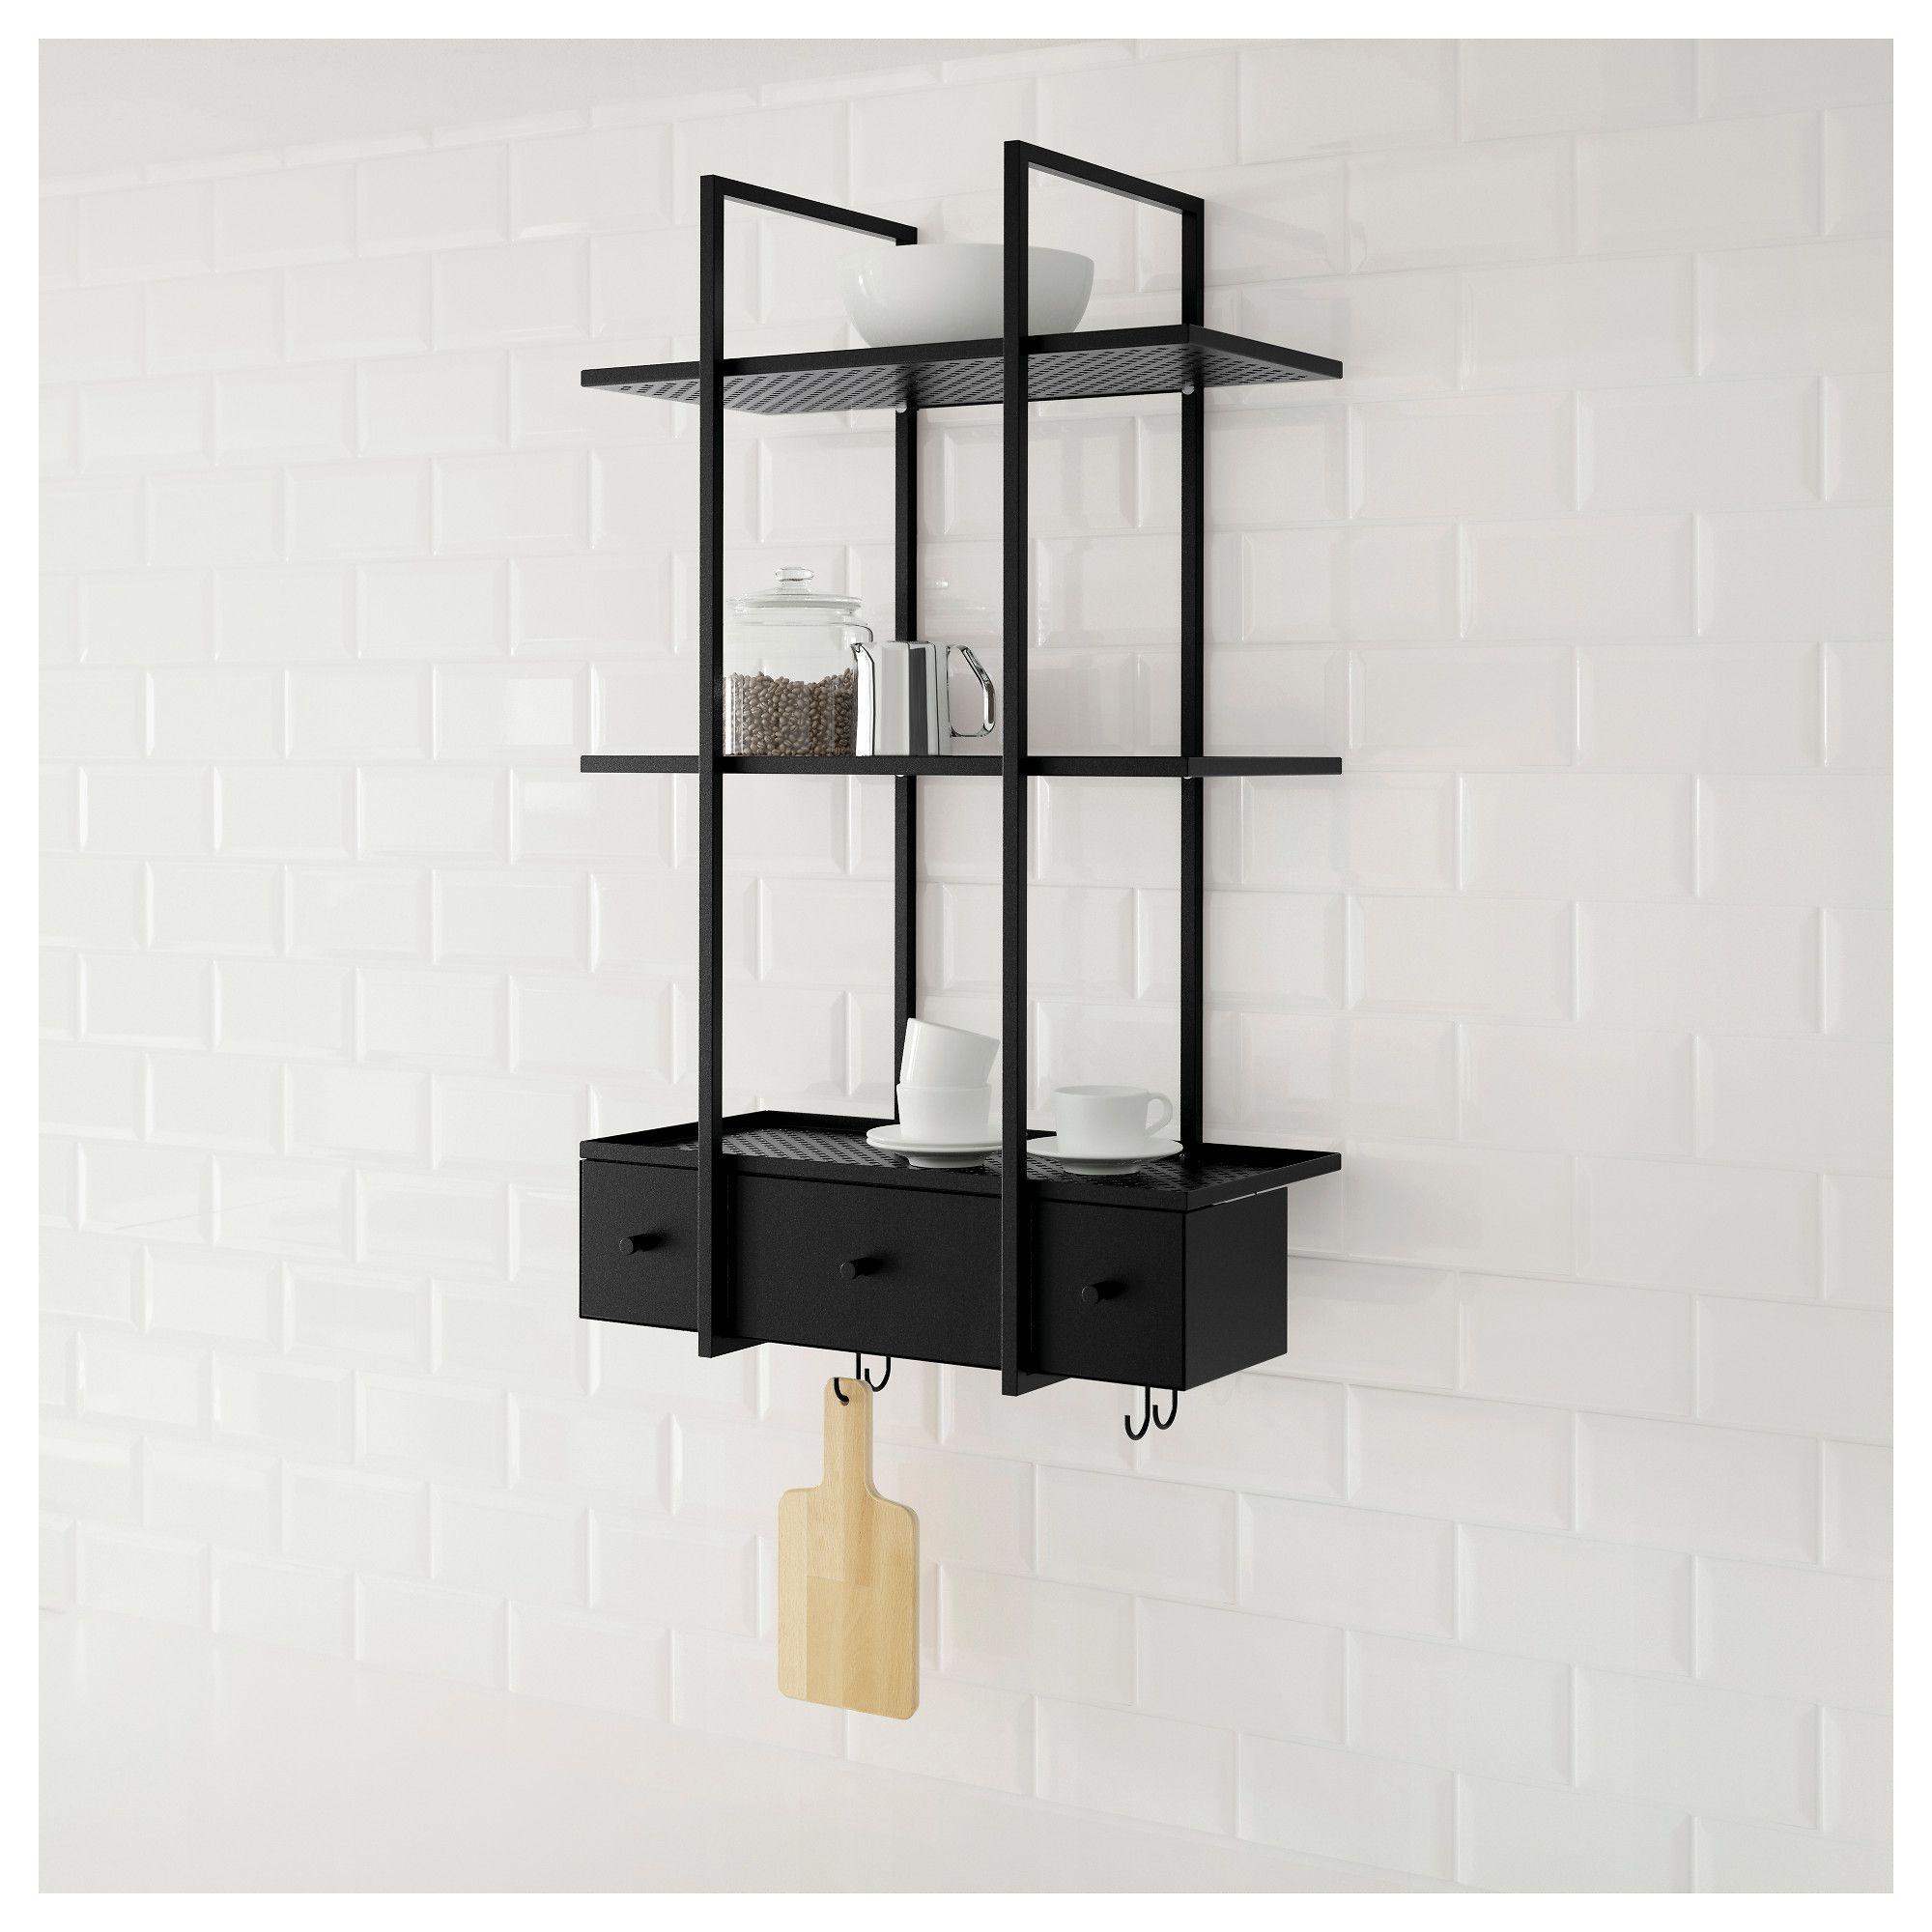 Einzigartig Balkon Ikea Konzept Terrasse Design Ideen